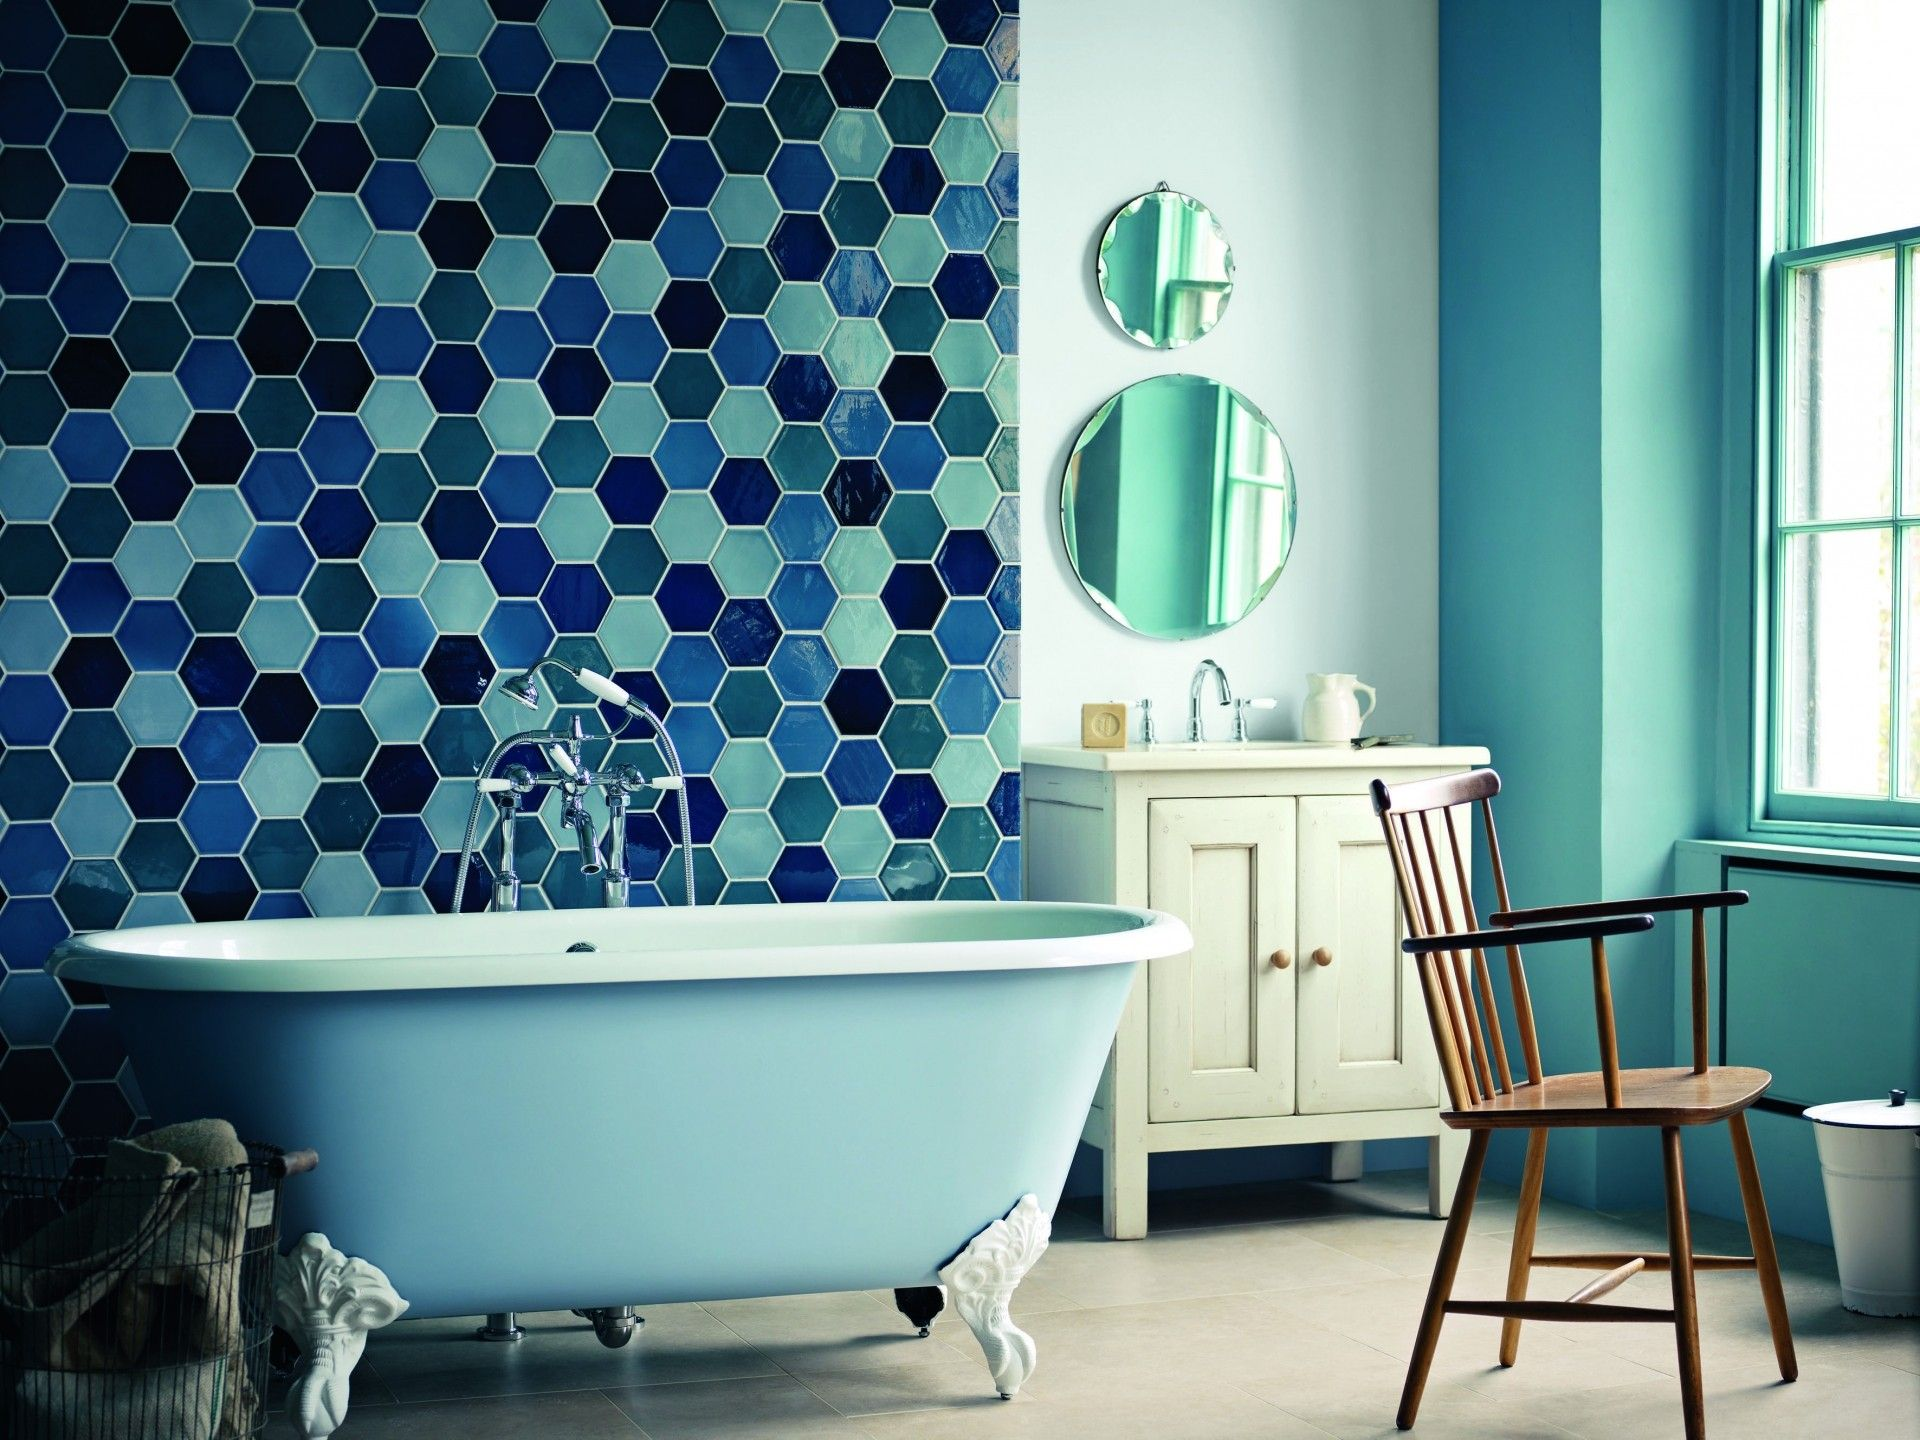 Cute Blue Fiberglass Stand Alone Clawfoot Tub And Blue Hexagon ...